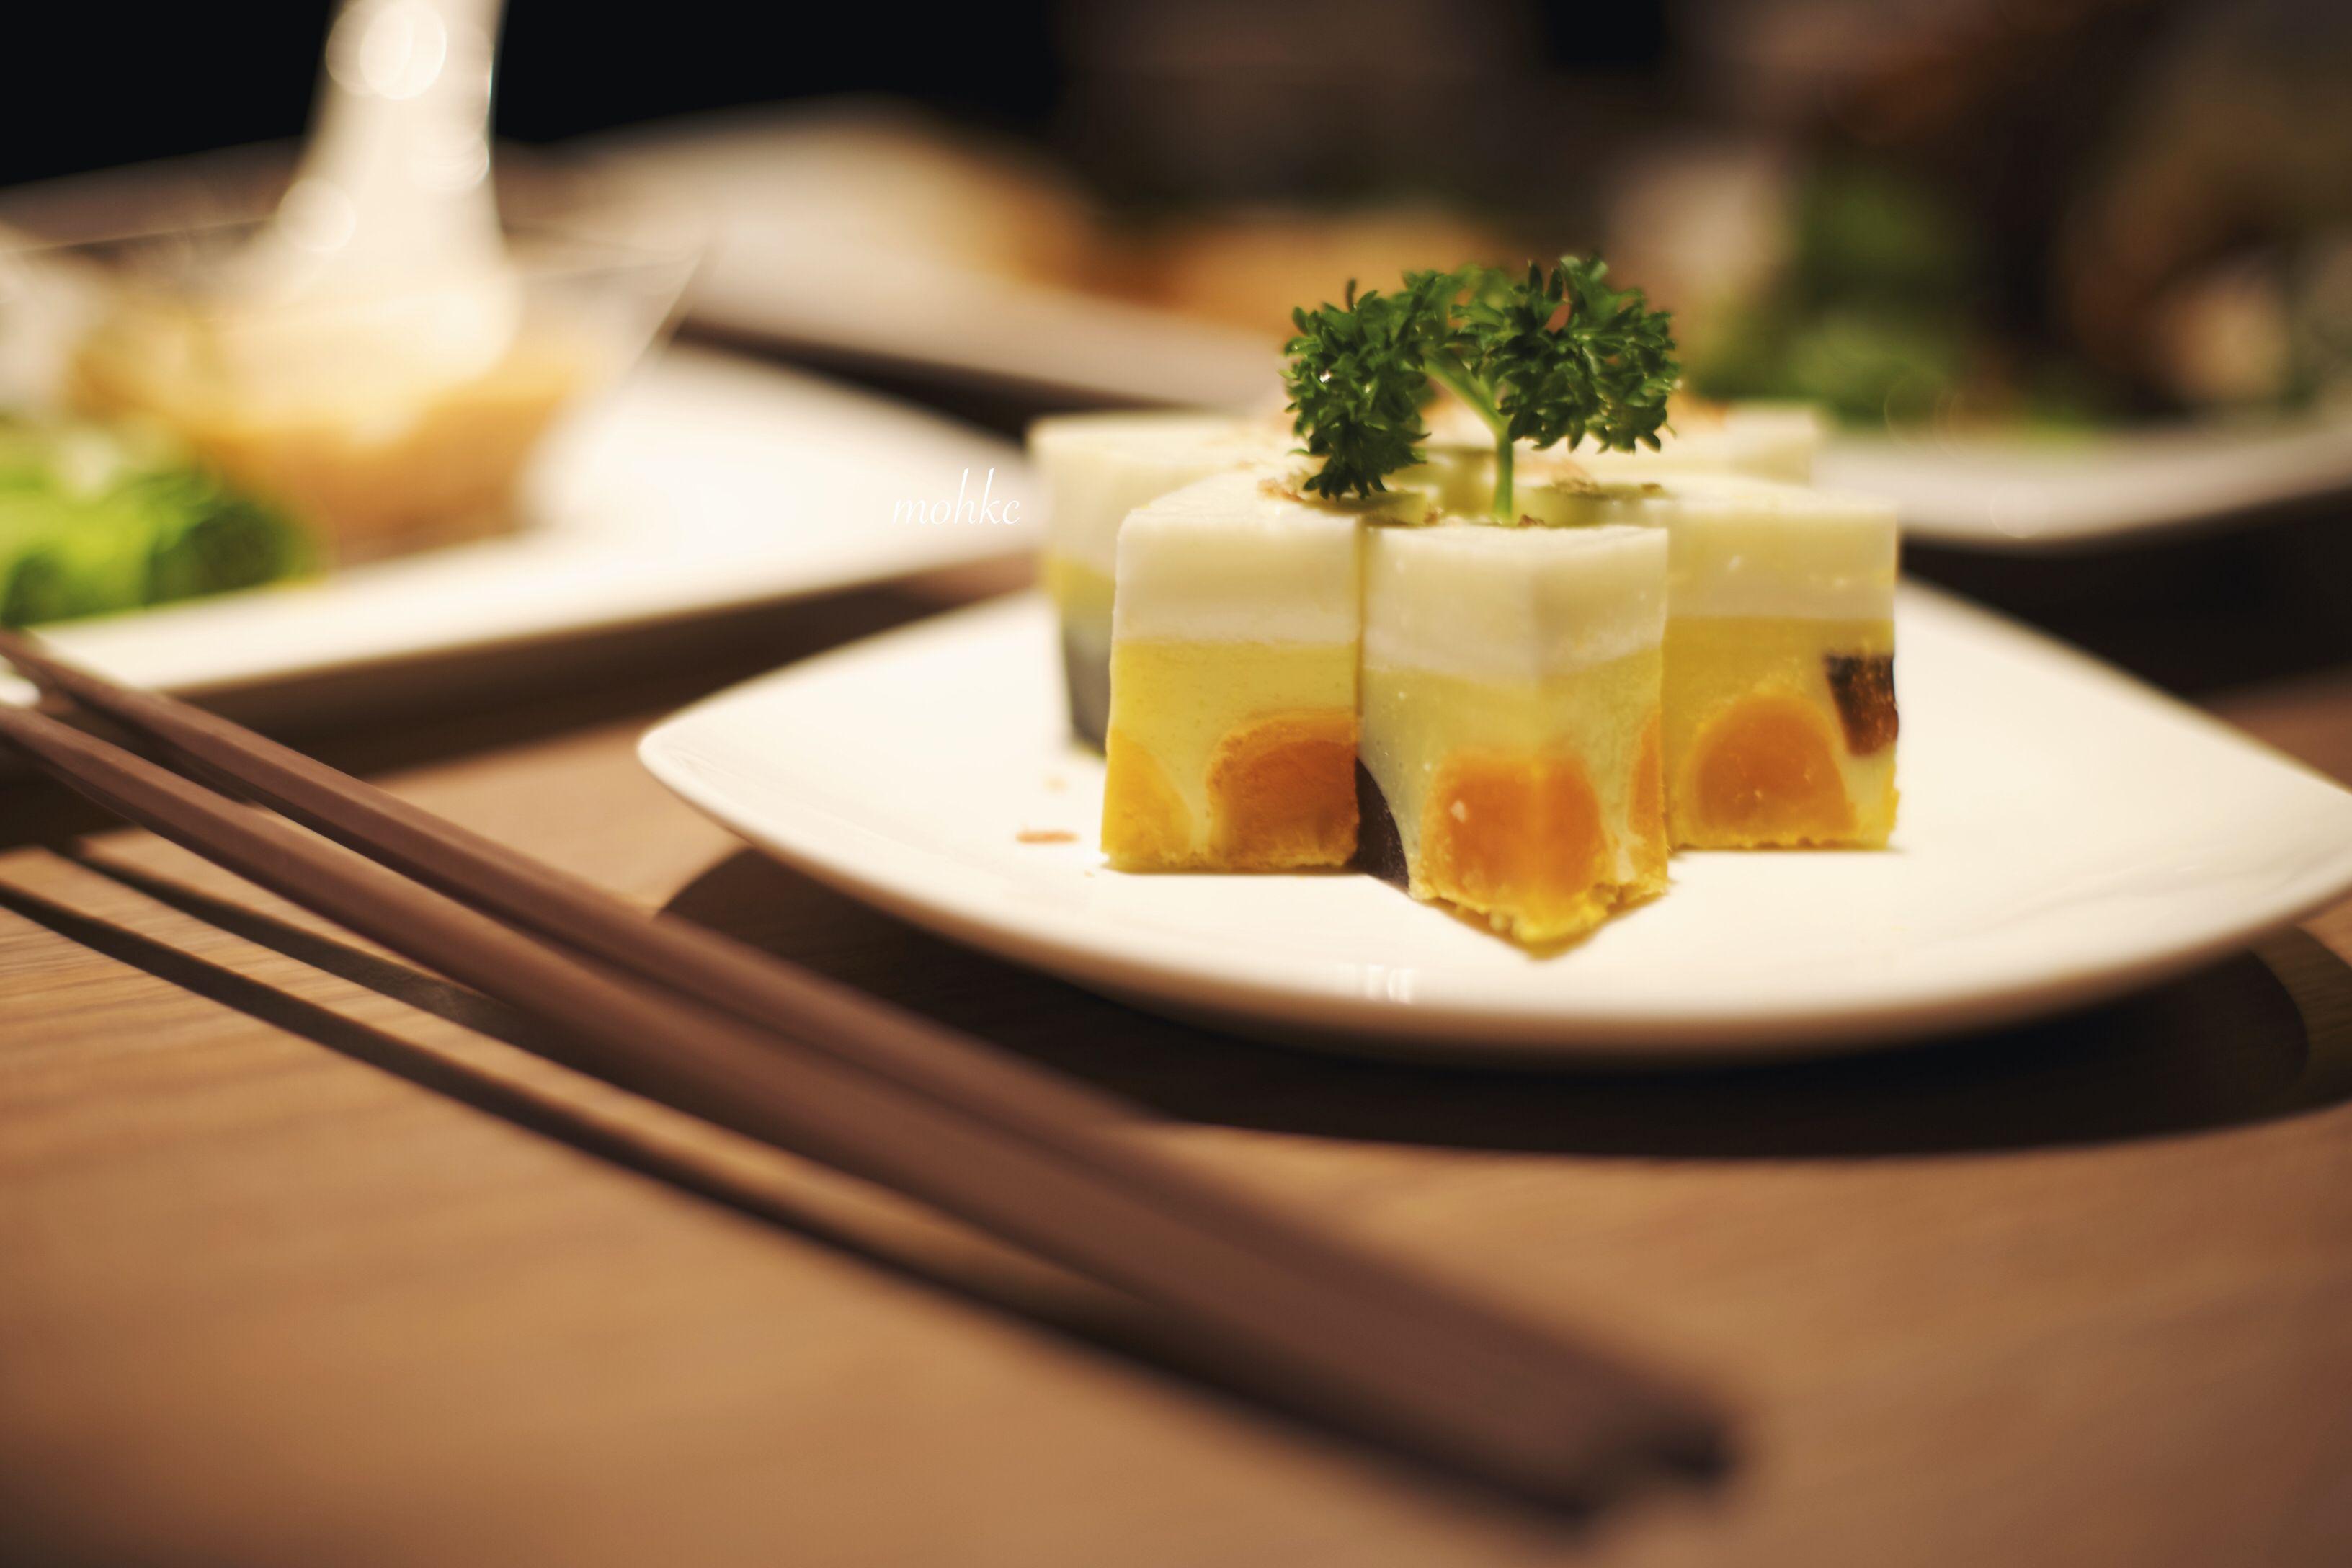 Paradise Dynasty 樂天皇朝 Guangdong  /  Shanghai  /  Chinese Buns  /  Stir-Fry Photo by mohkc Hong kong food